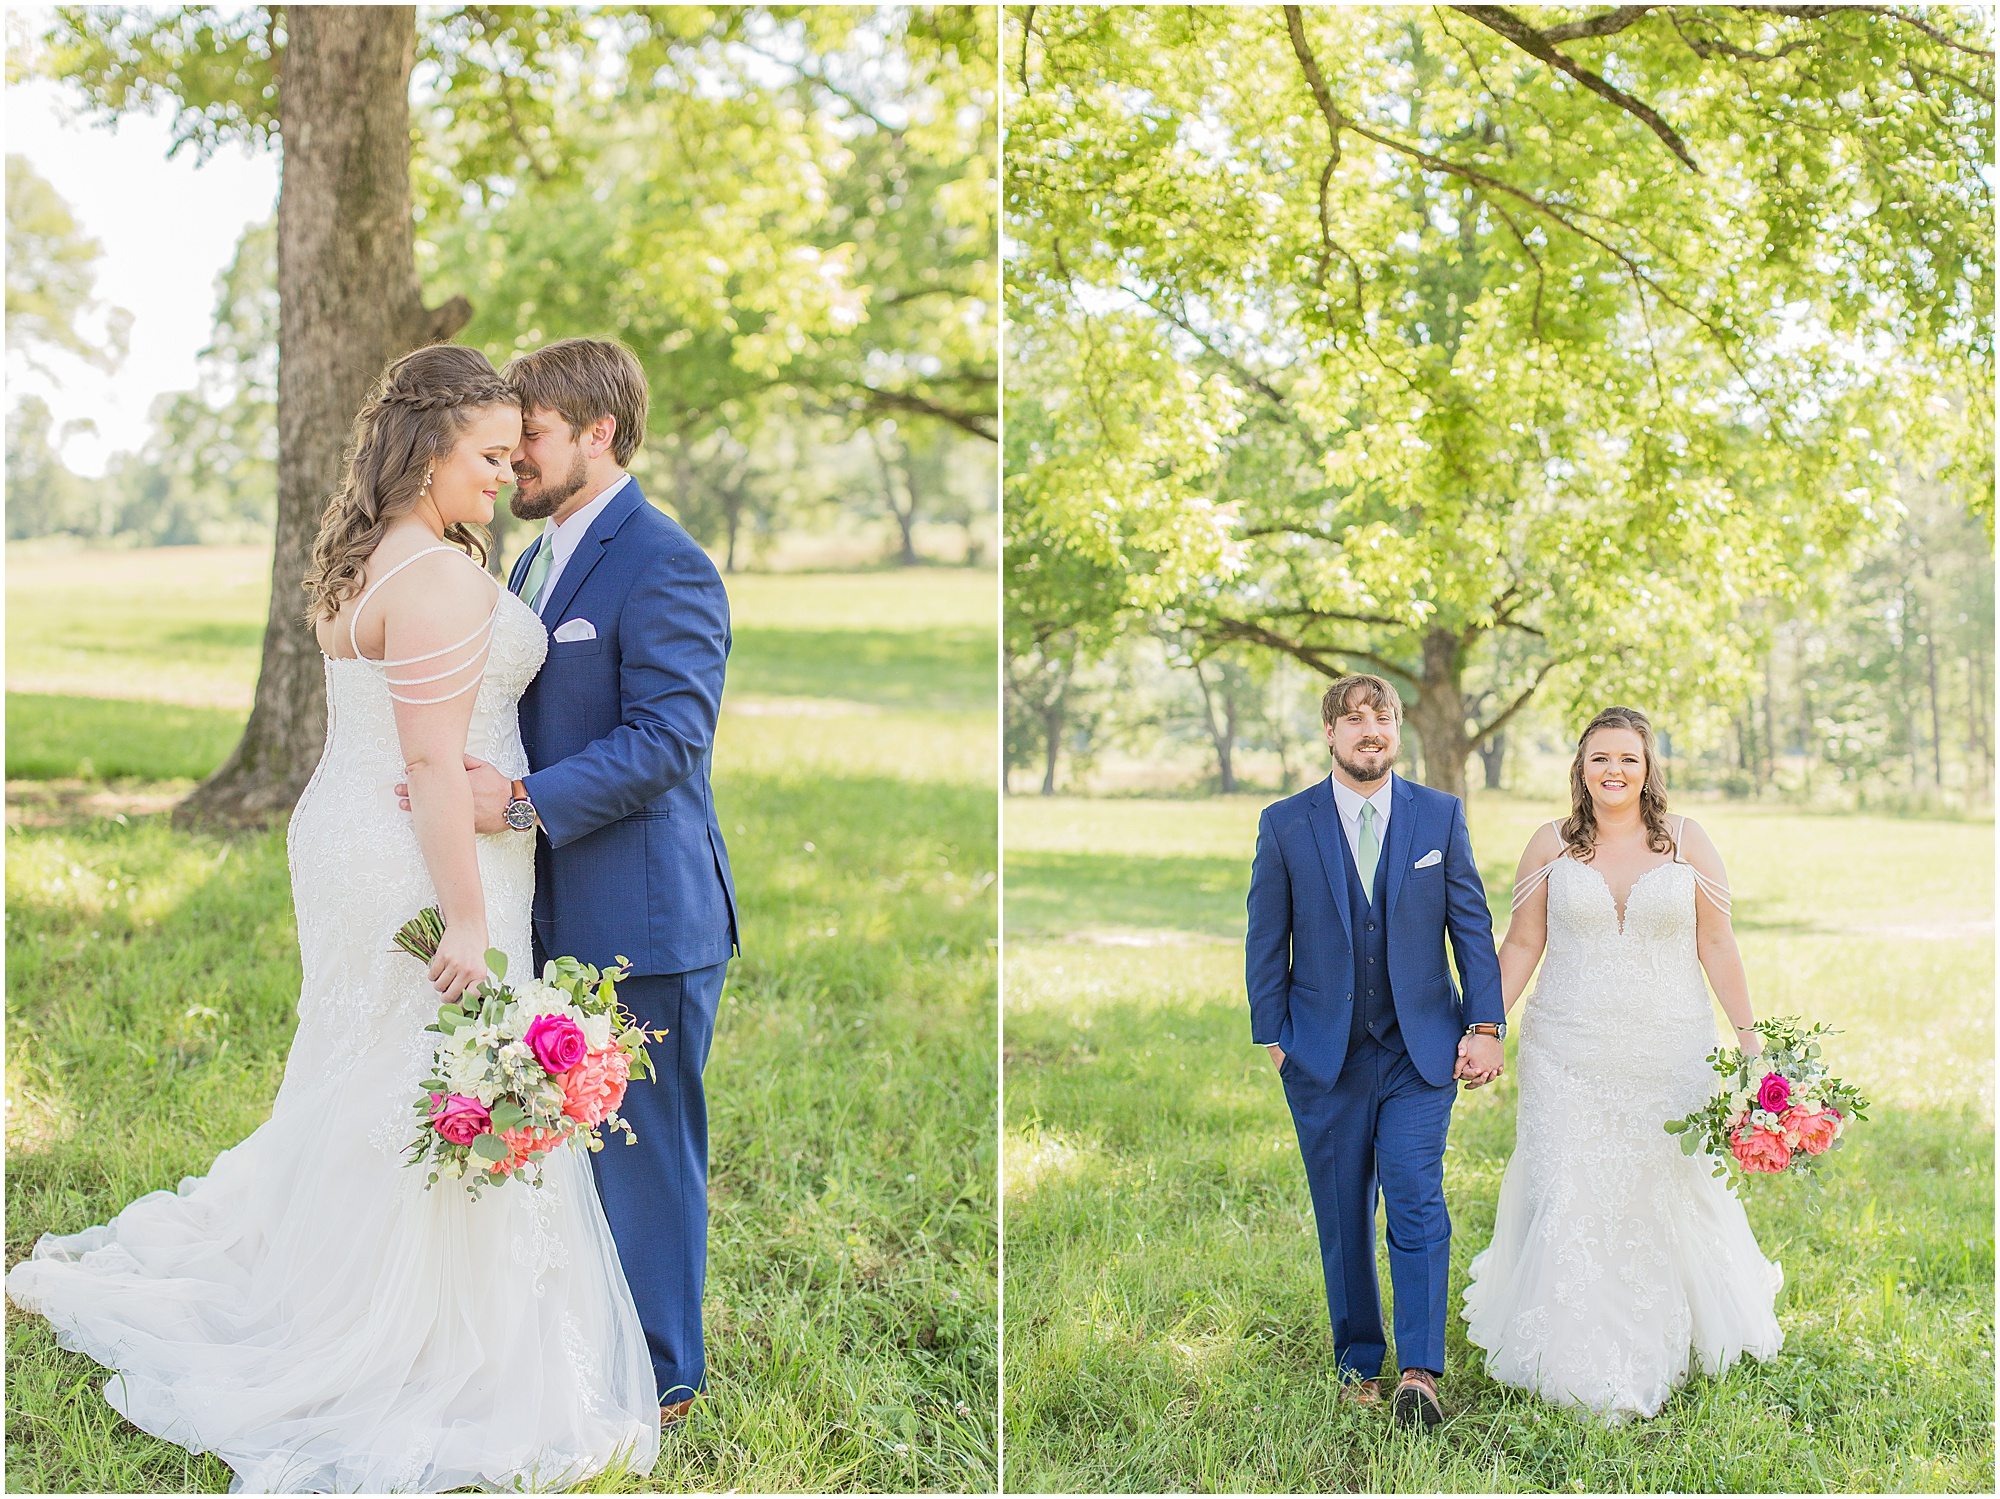 starkville-mississippi-wedding-page-place-dodson-farms_0032.jpg